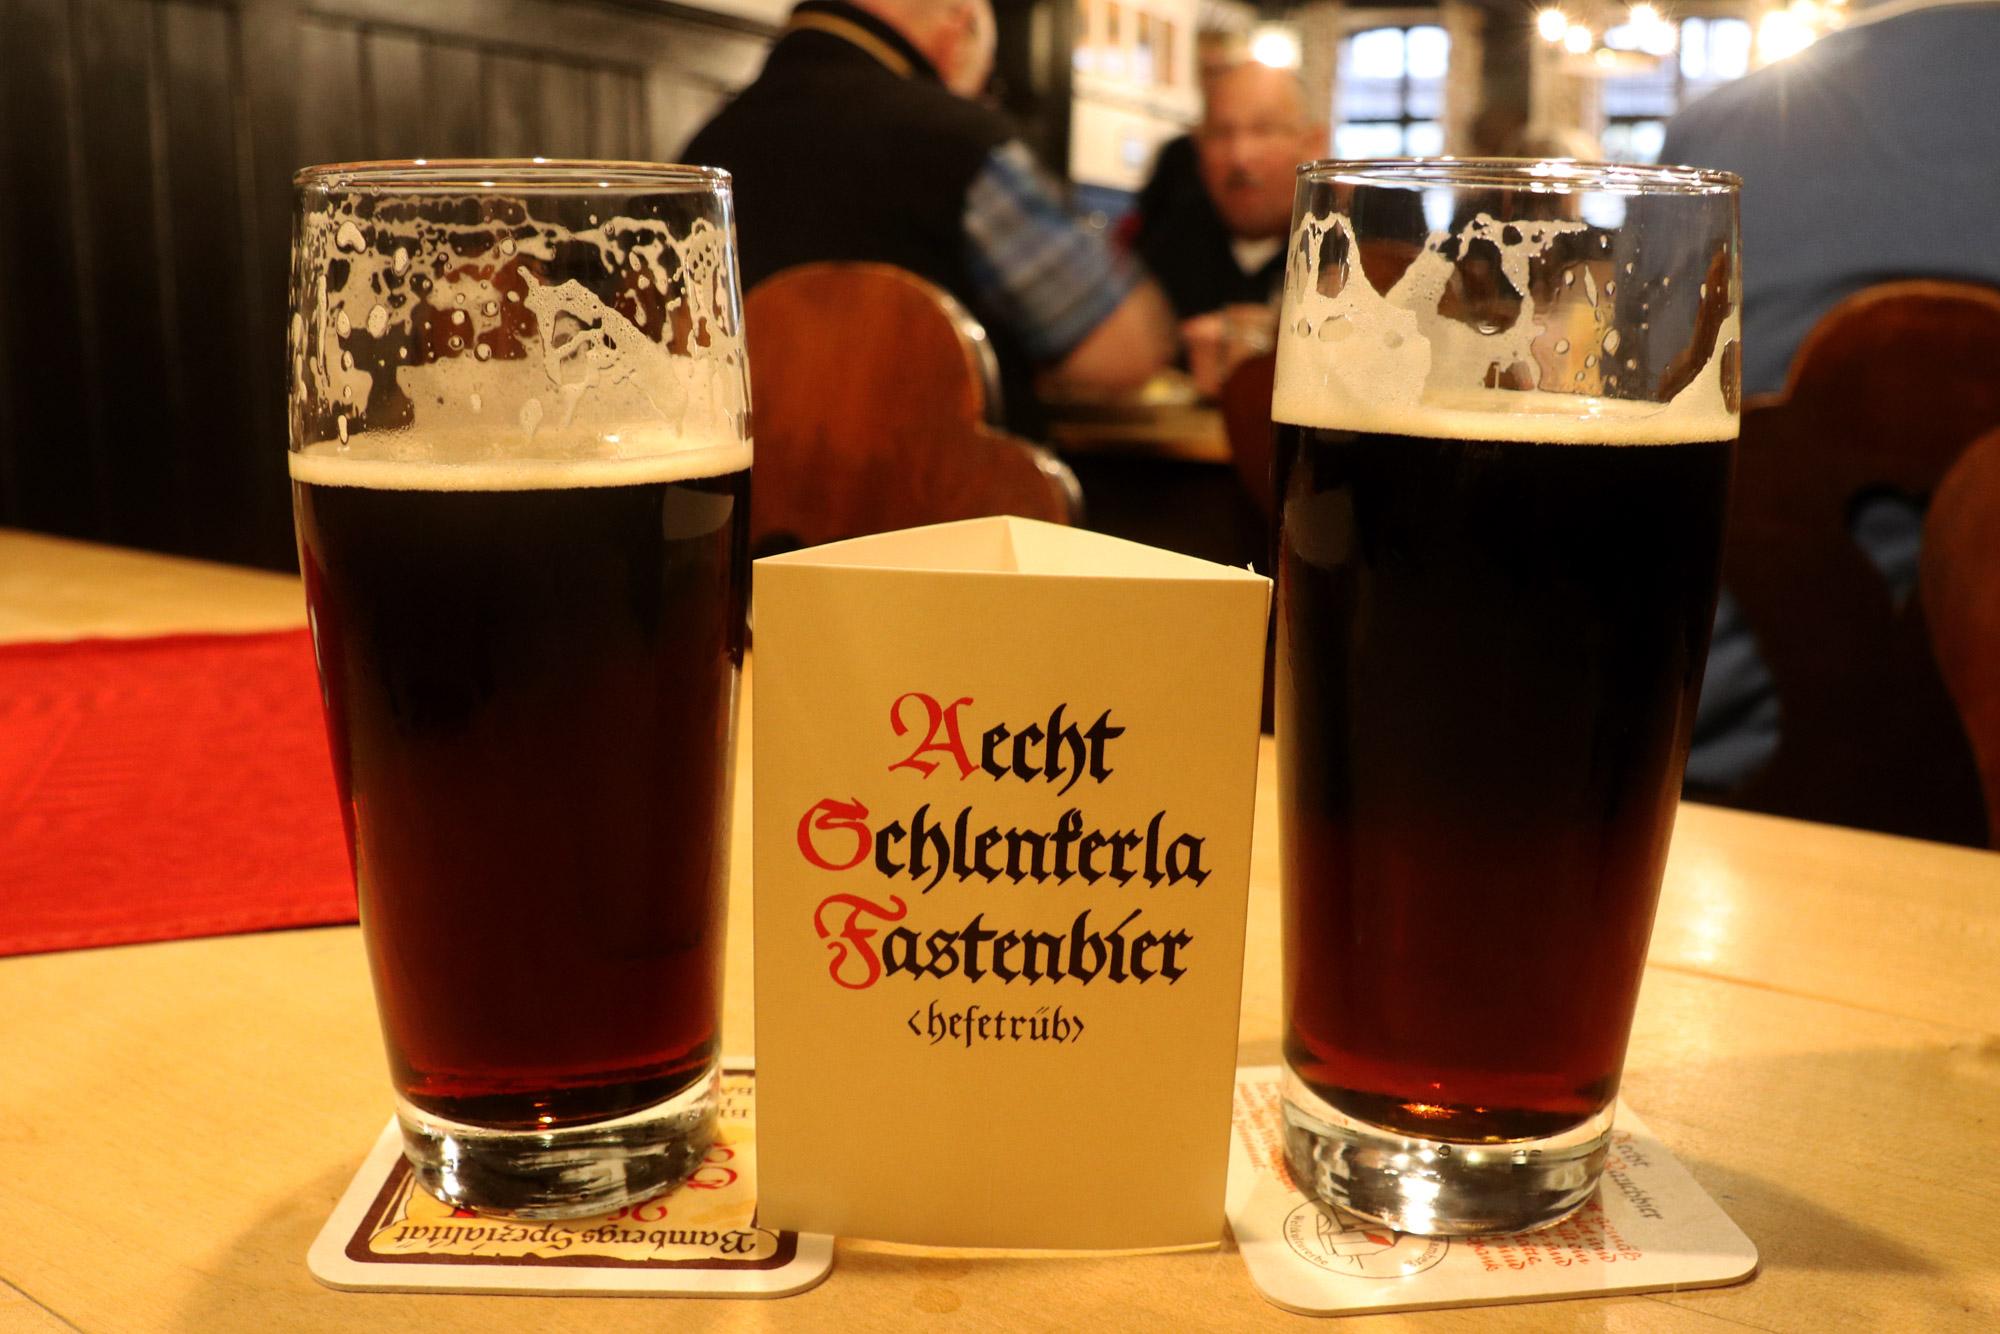 Bamberg in 10 beelden - Aecht Schlenkerla Rauchbier